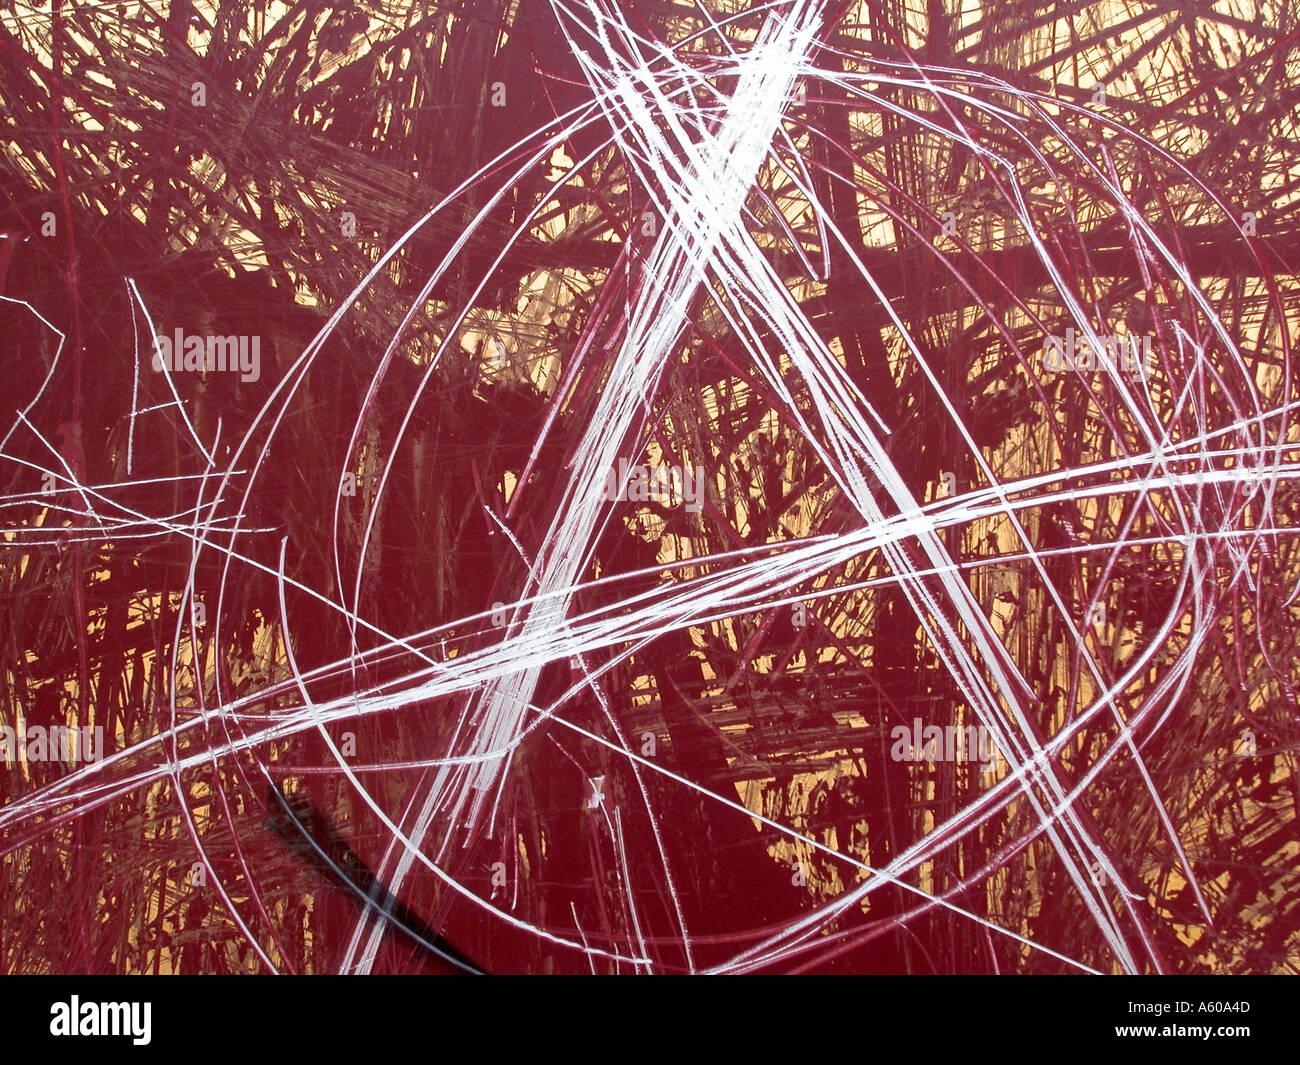 graffitti anarchism sign - Stock Image